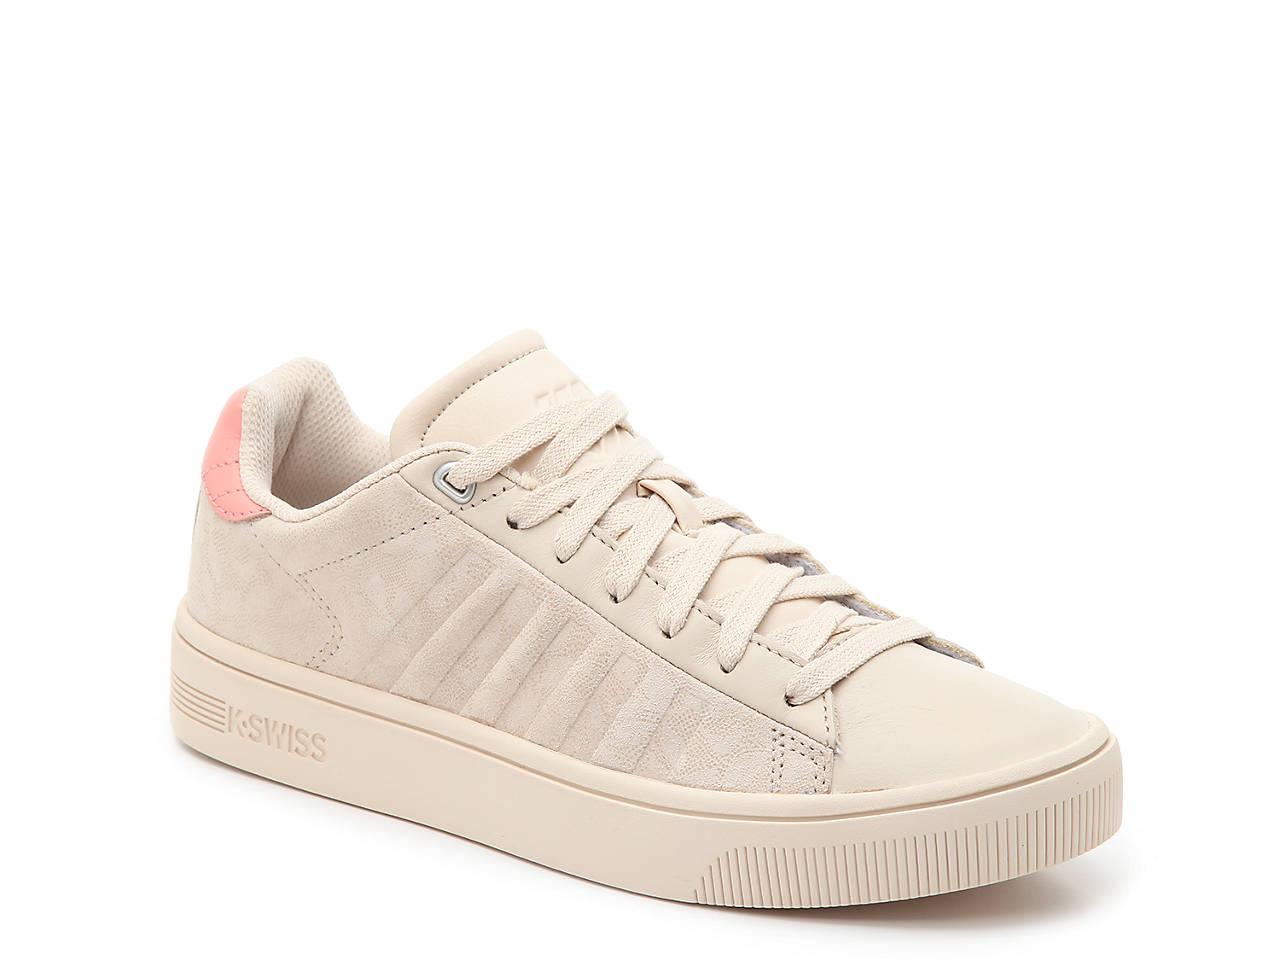 53e6fc0b3a14c0 K-Swiss Court Frasco Sneaker - Women s Men s Shoes